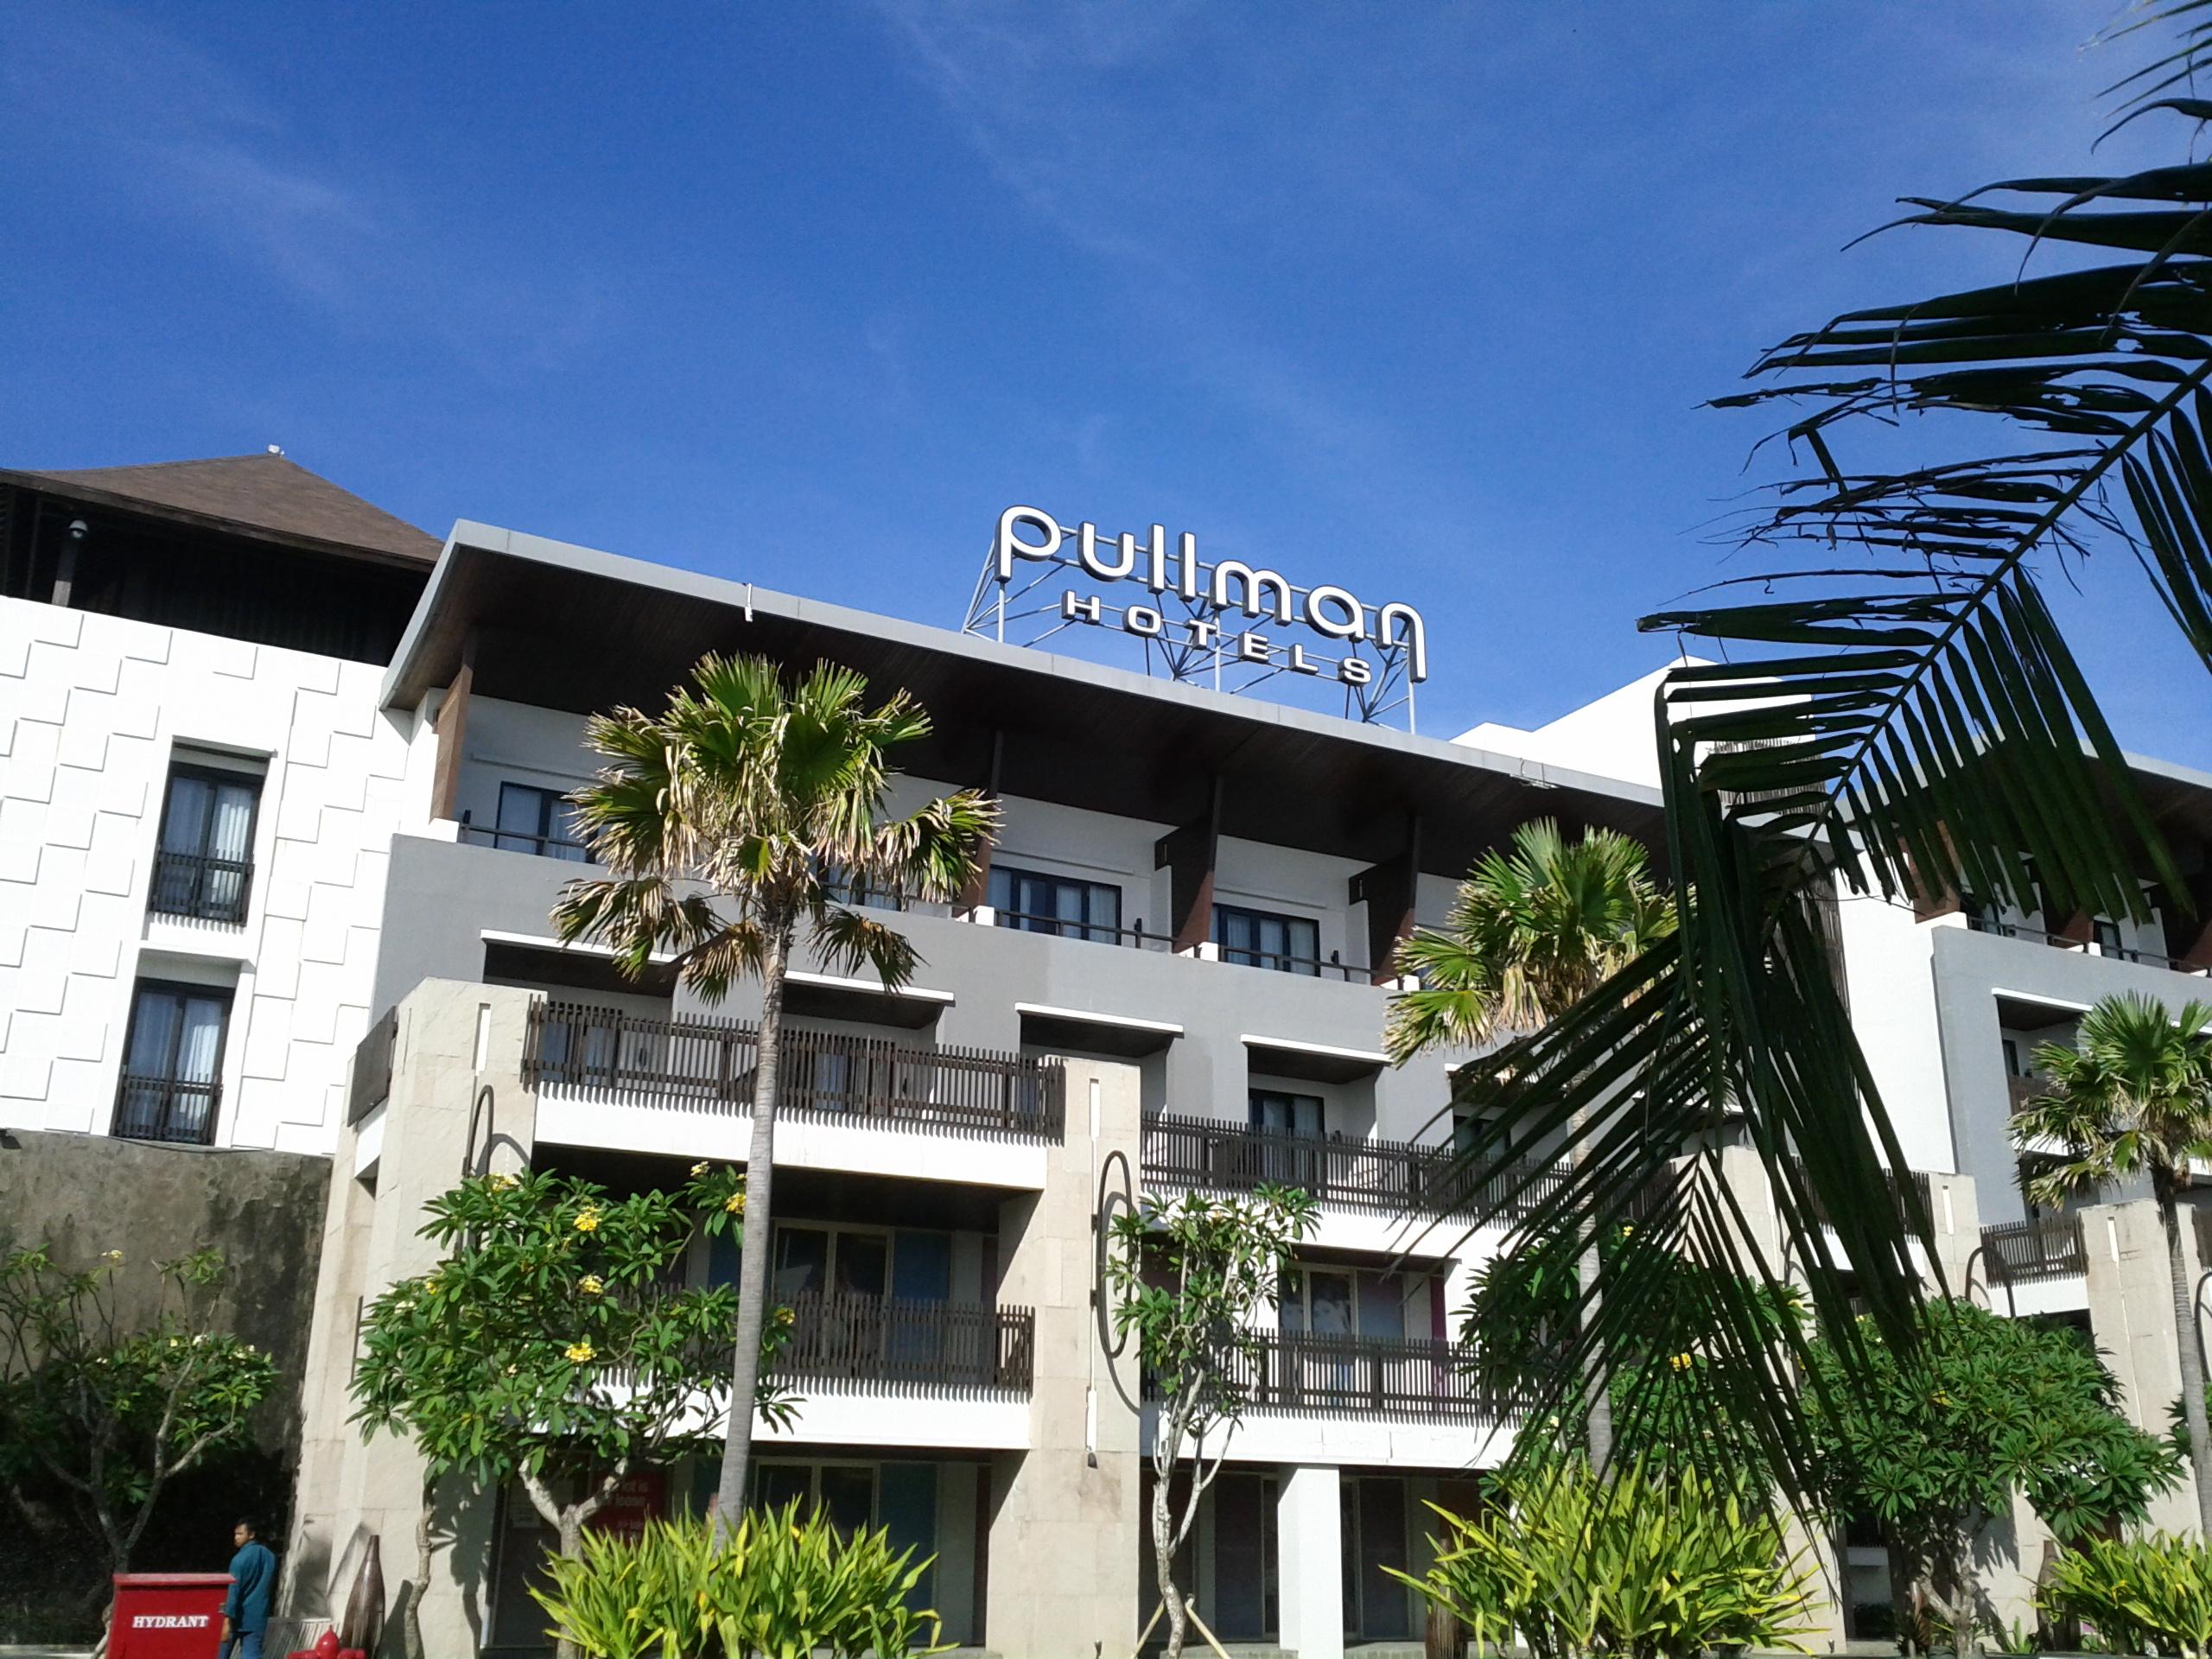 Pullman bali legian nirwana hotel indonesia review of for Hotels in legian bali